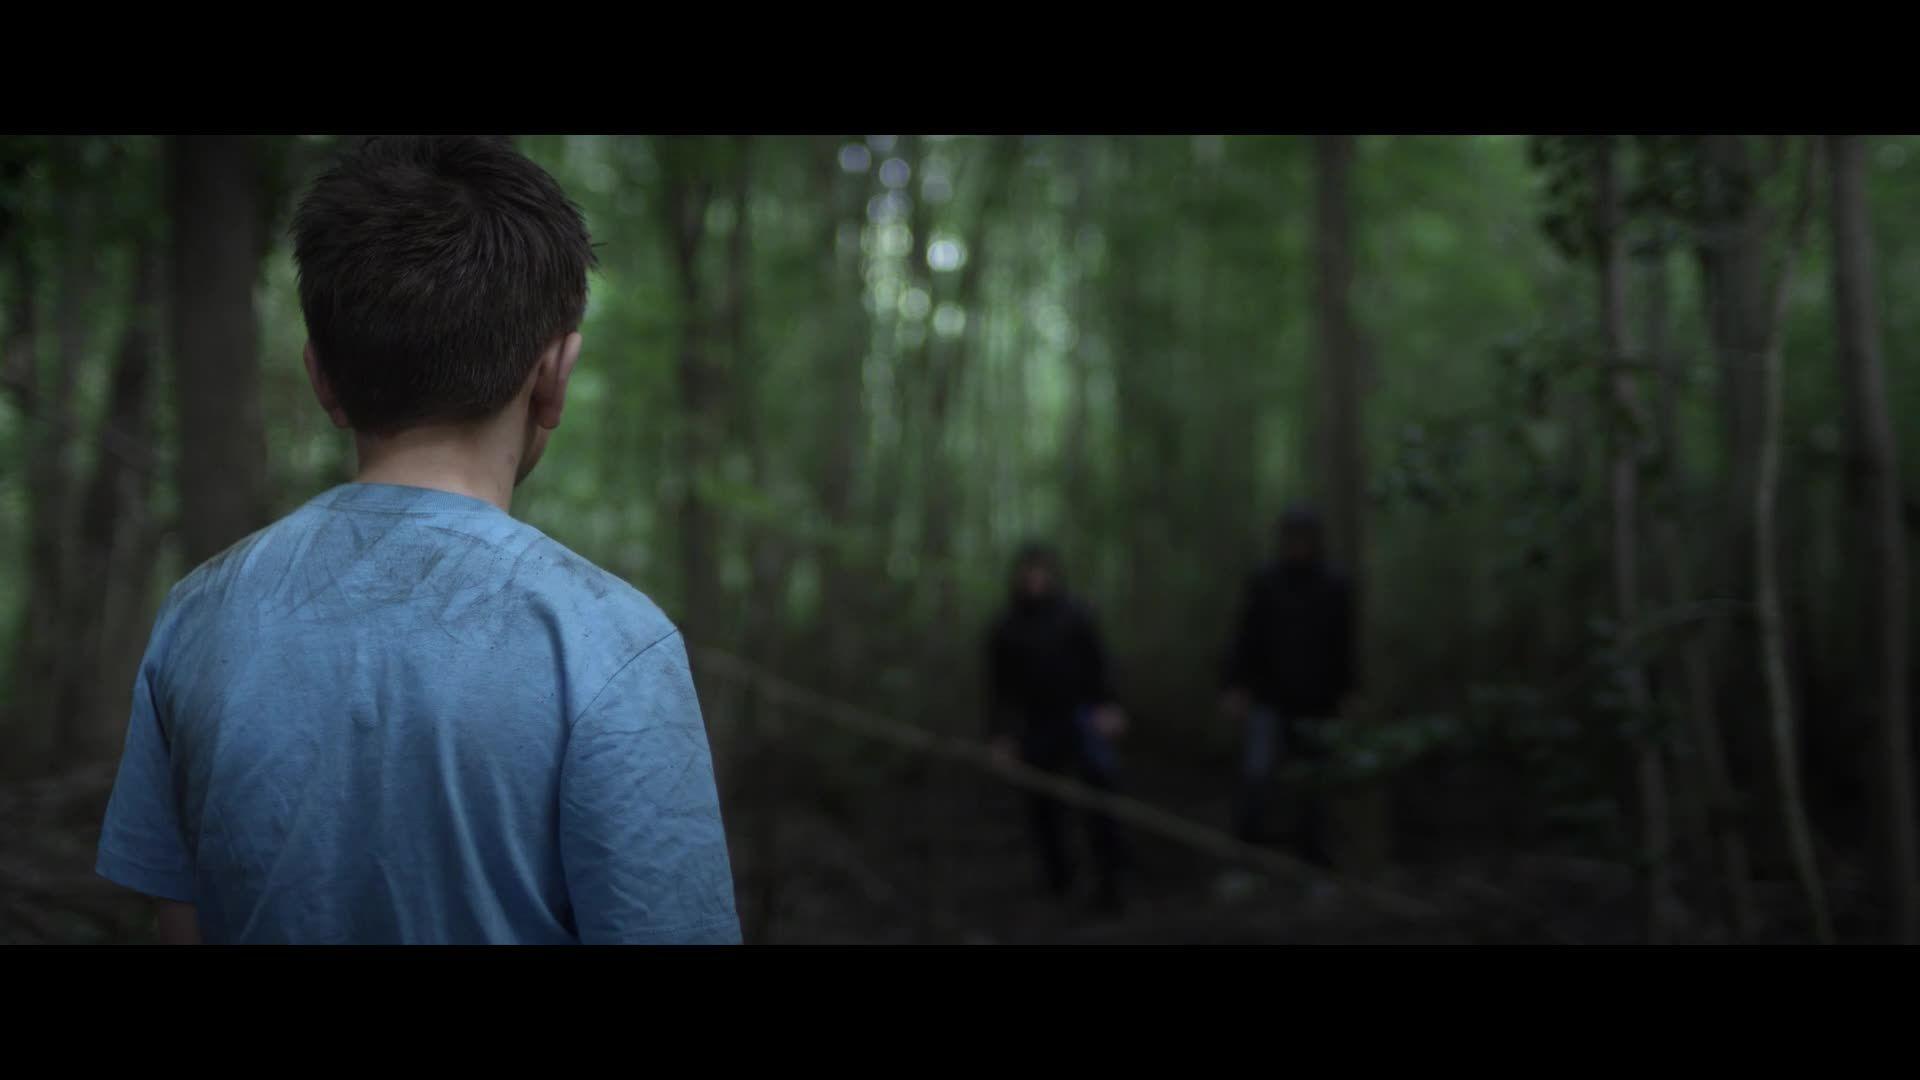 Fawn - Director's Cut